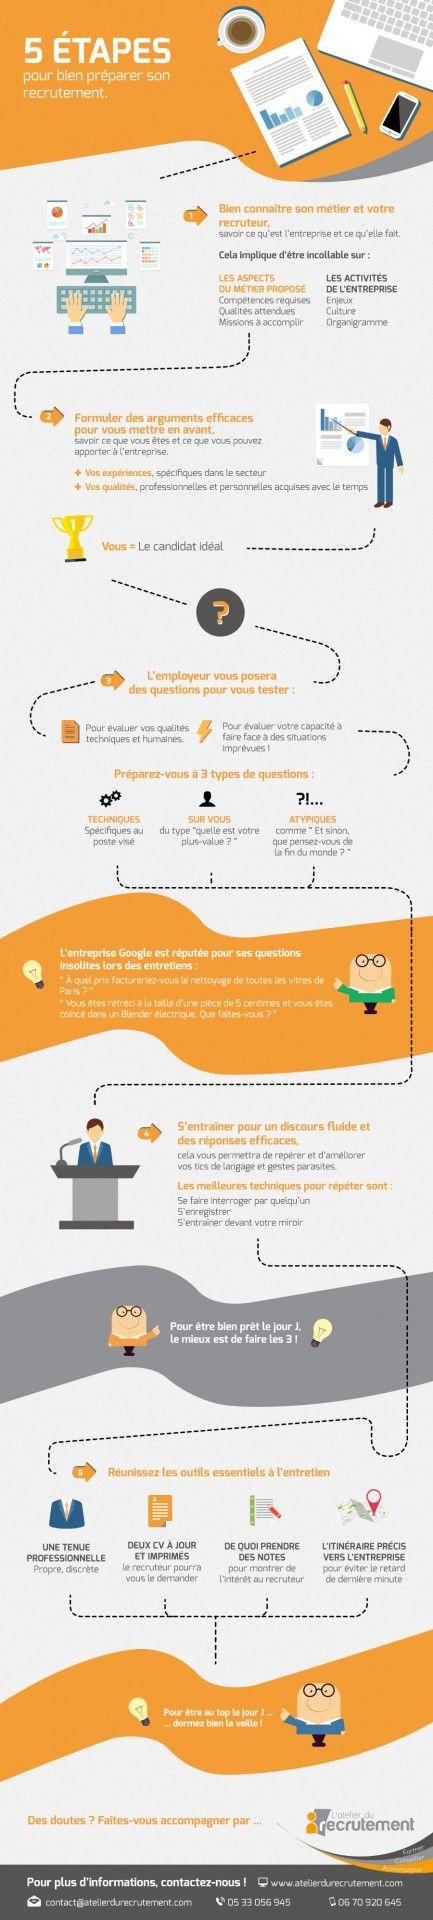 LatelierDuRecrutement_Infographie